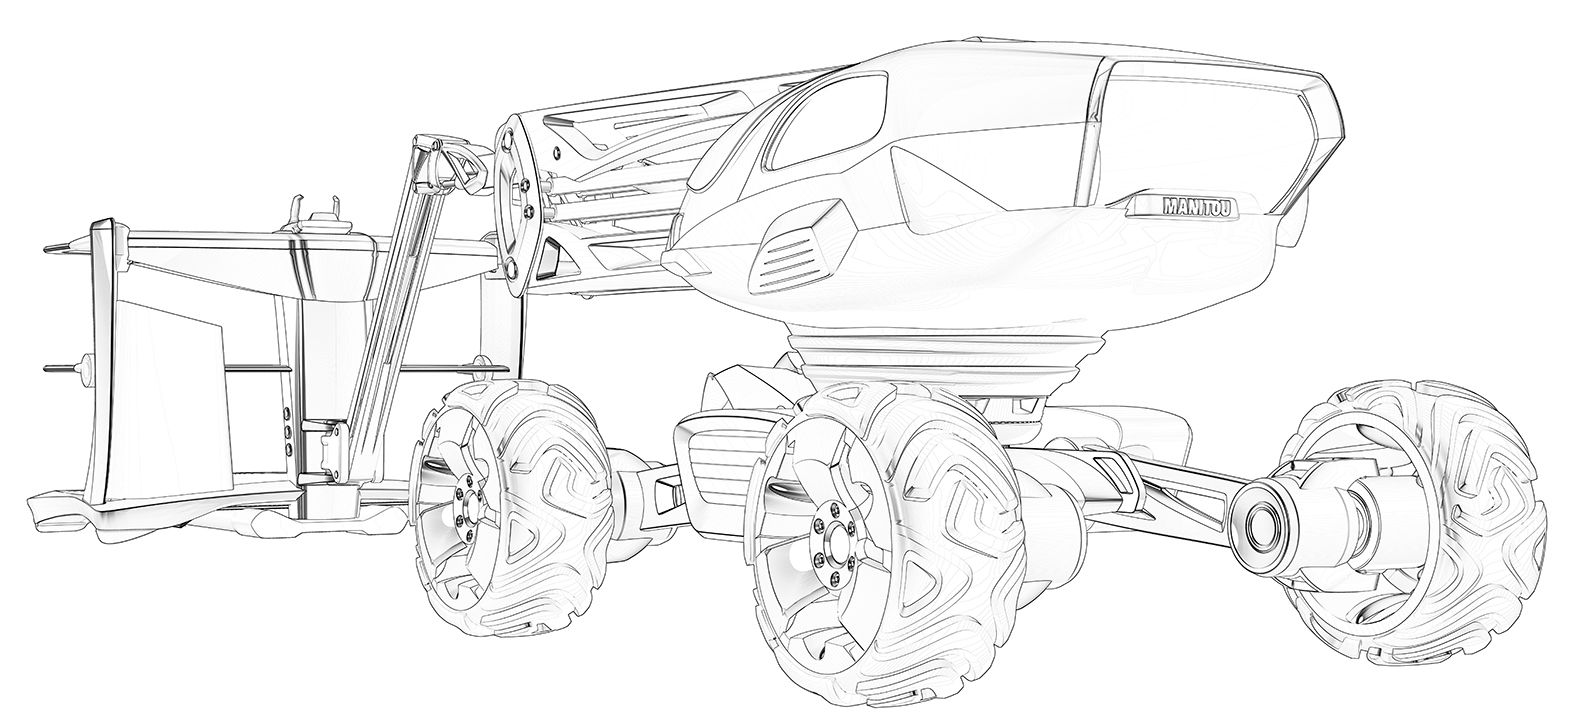 Traktor Fendt Ausmalbilder : Concept Truck Nacelle Rendus Design Manitou Pinterest